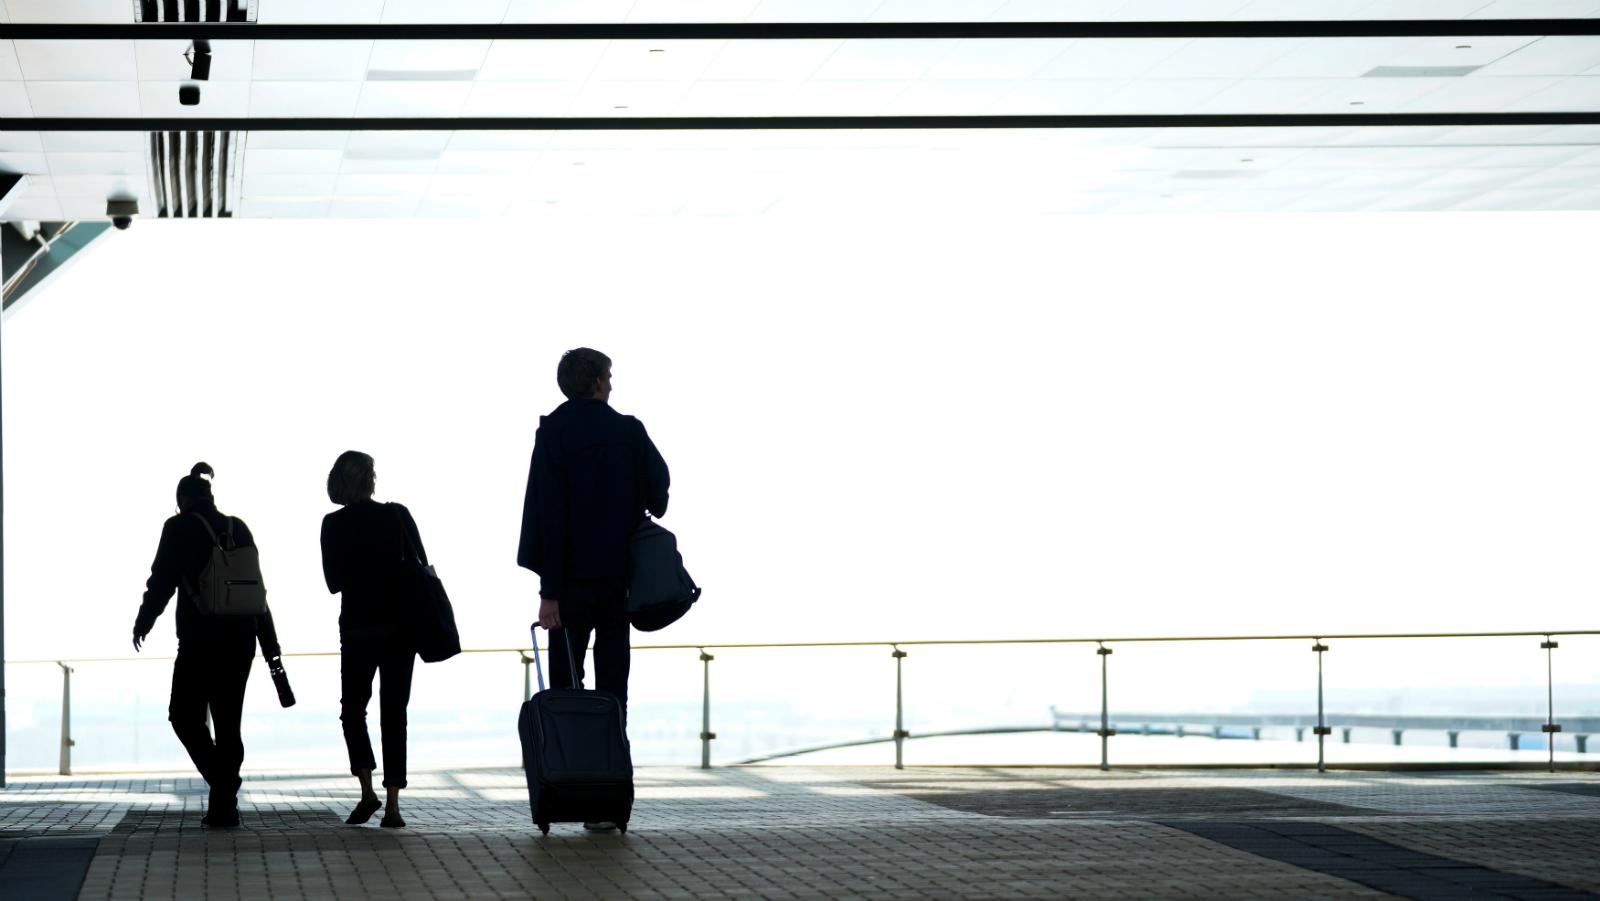 Travelers enter the airport hotel at Denver International Airport in Denver, Colorado, U.S. November 3, 2017.